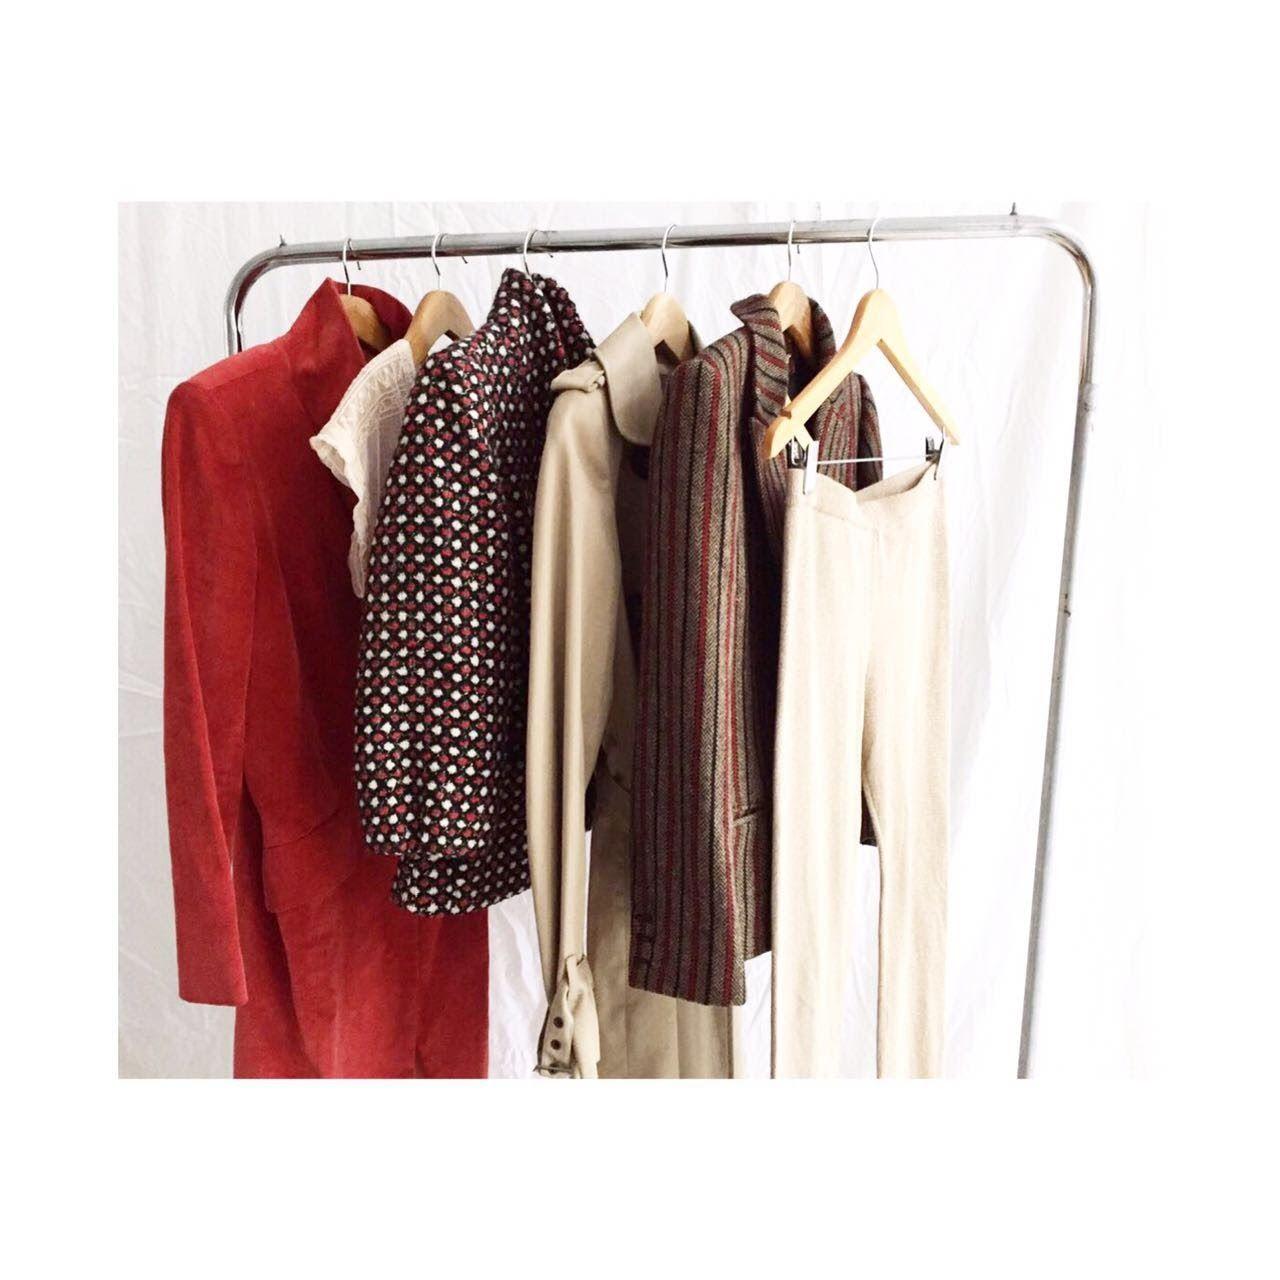 ebcb1852c Second Hand Clothes: un mundo de sensaciones - Revista Ocio